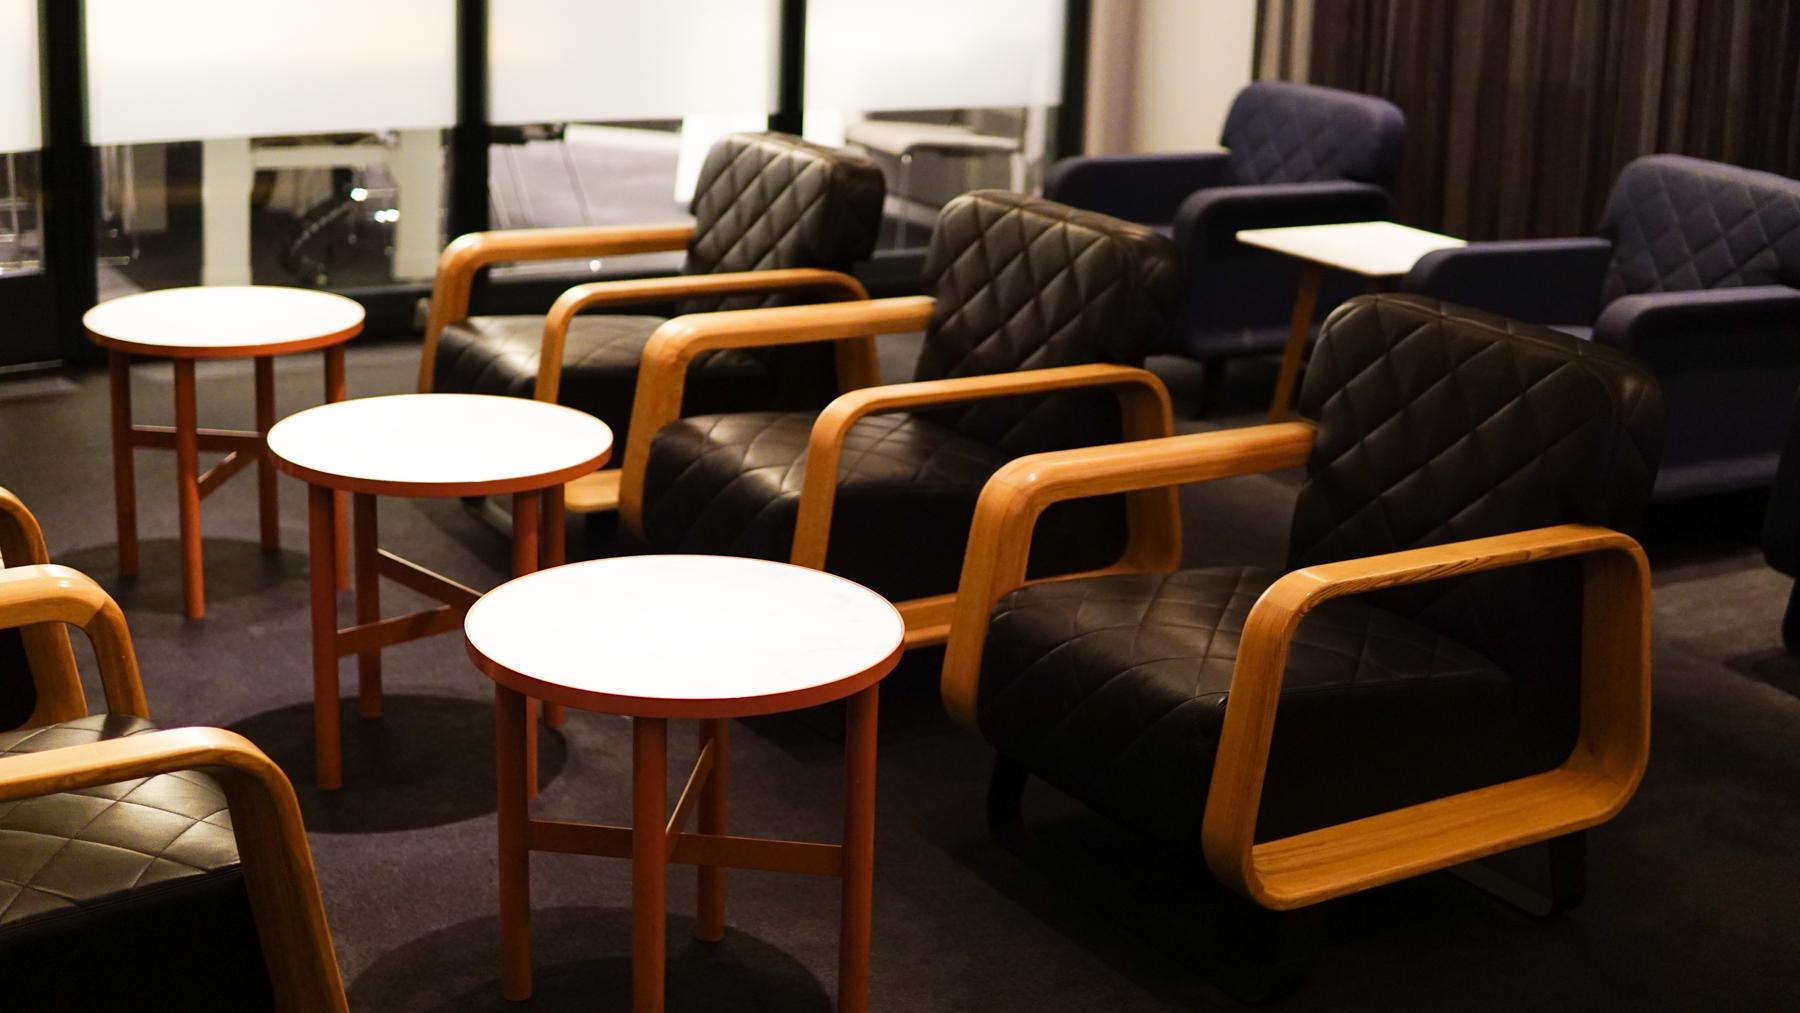 Qantas Perth Domestic Business Lounge meeting